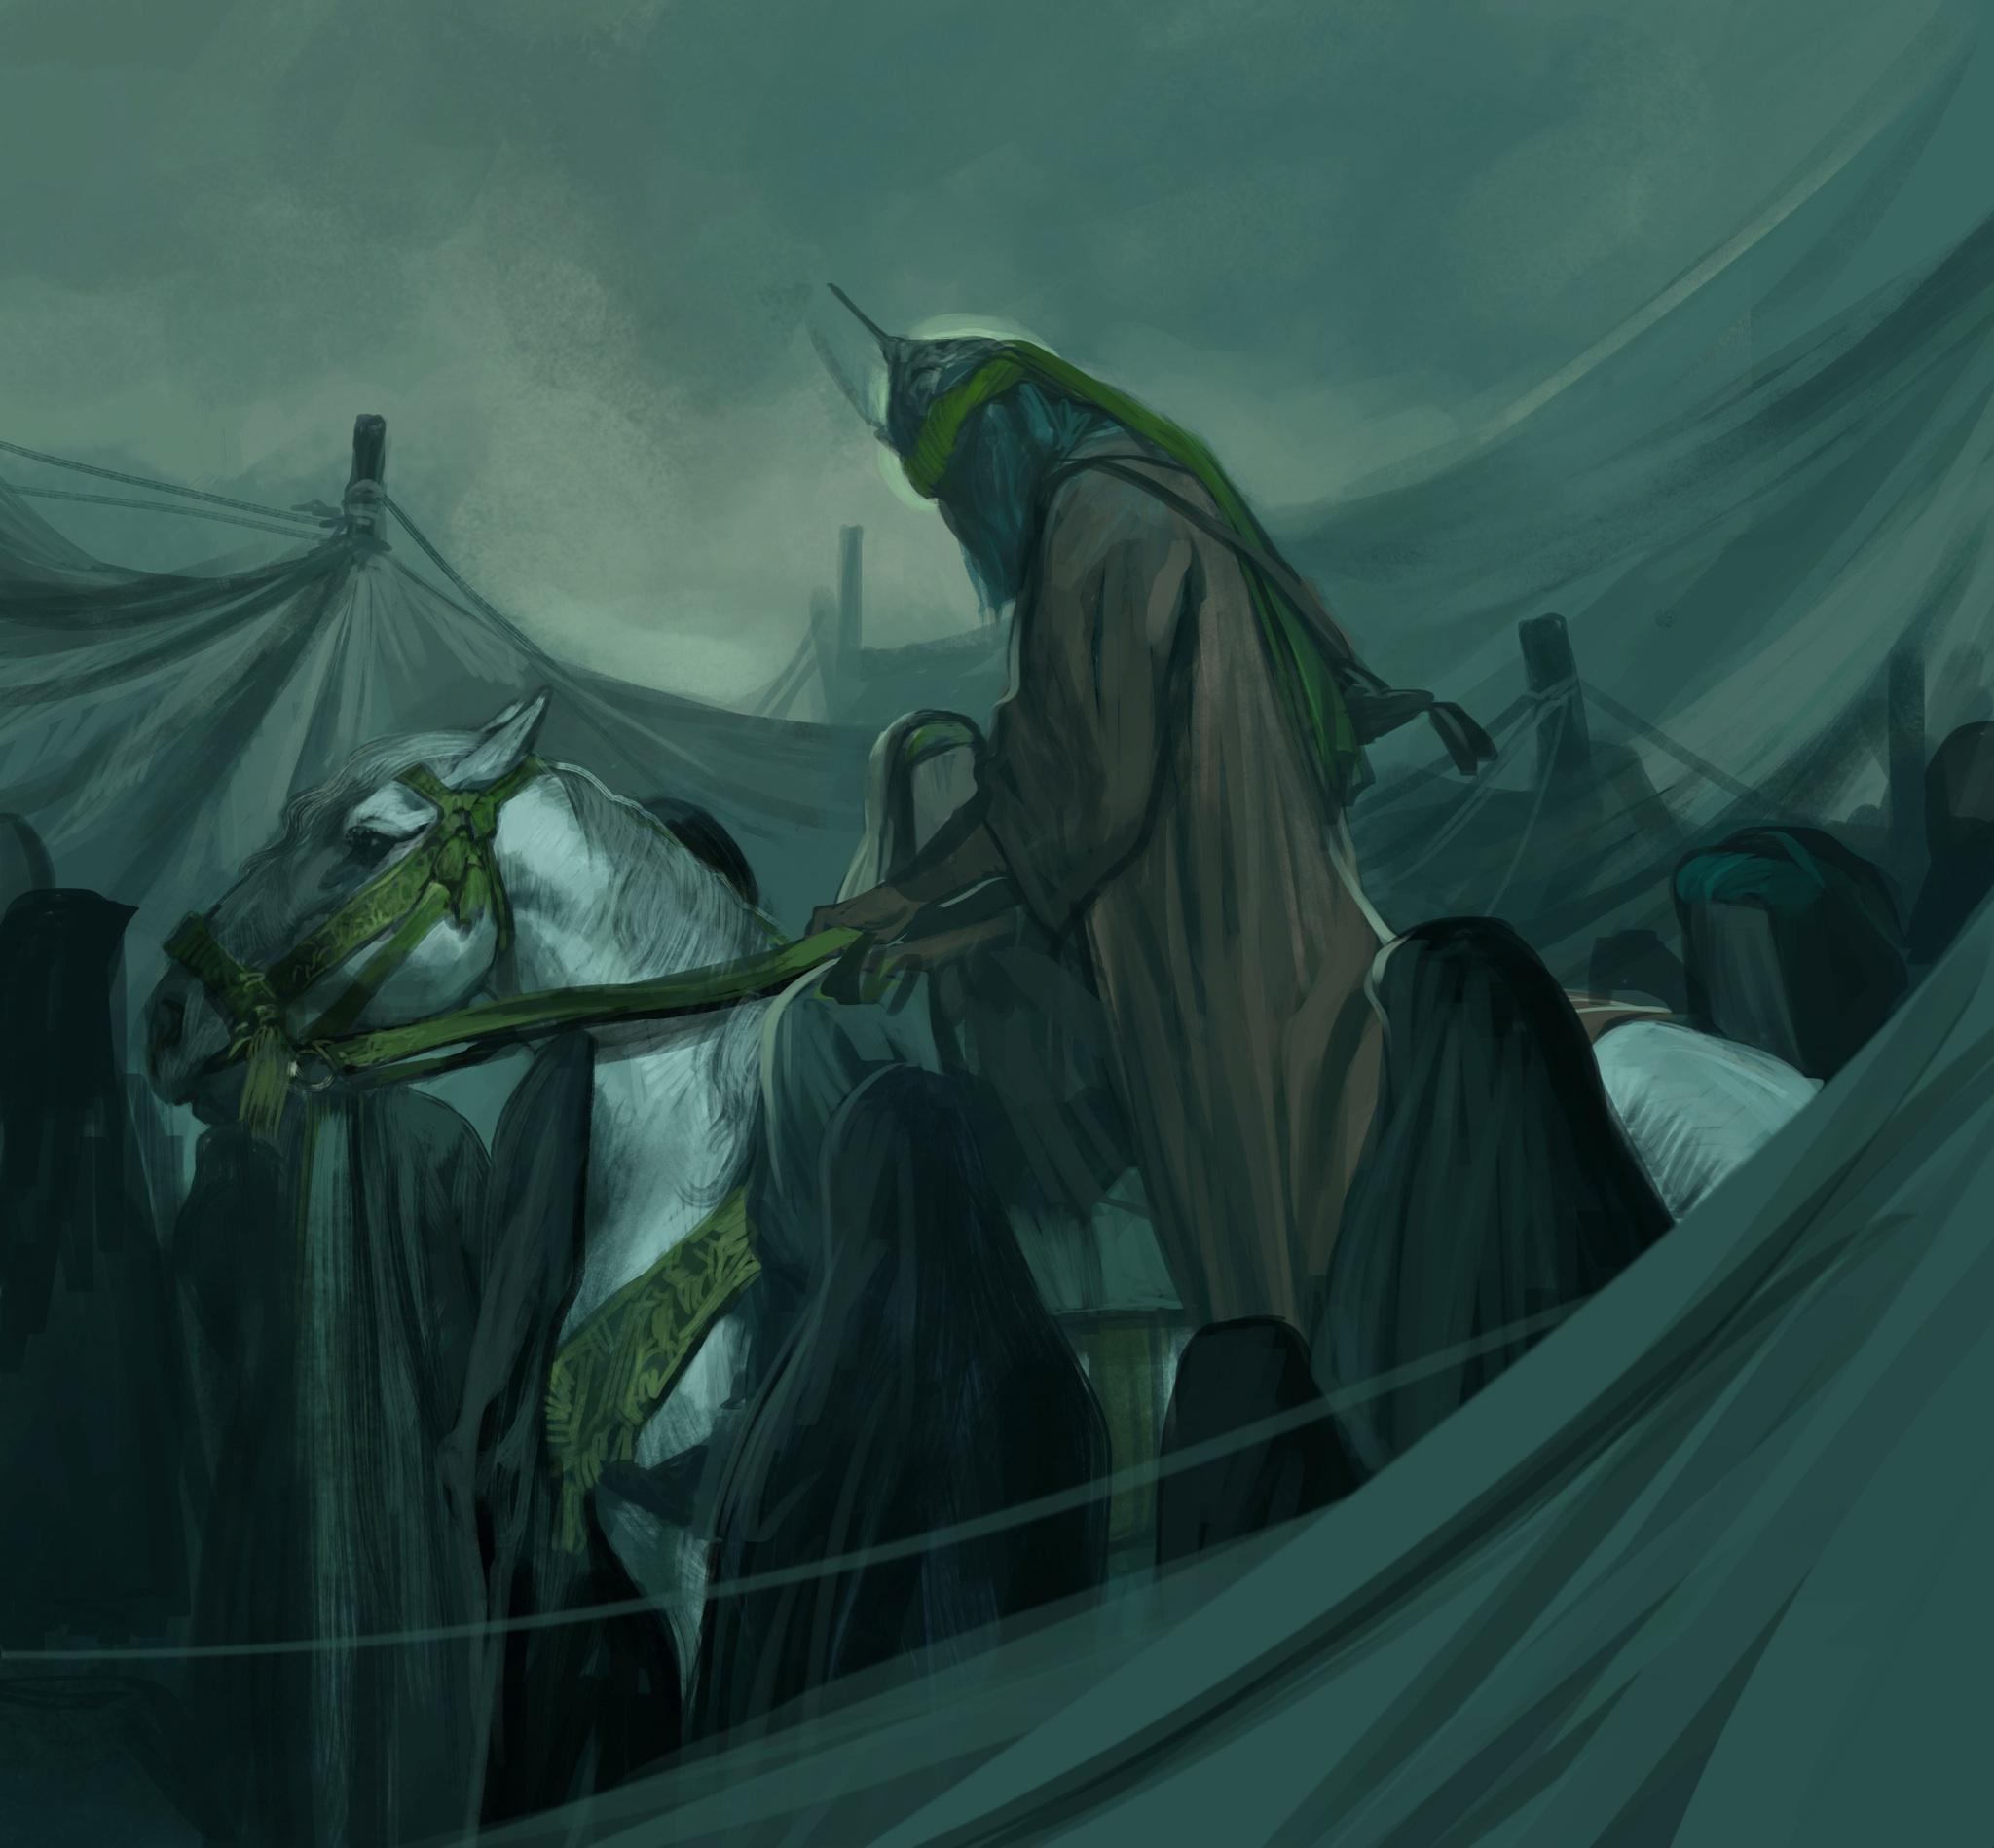 «یا ساقی العطاشا»؛ جدیدترین نقاشی عاشورایی حسن روحالامین